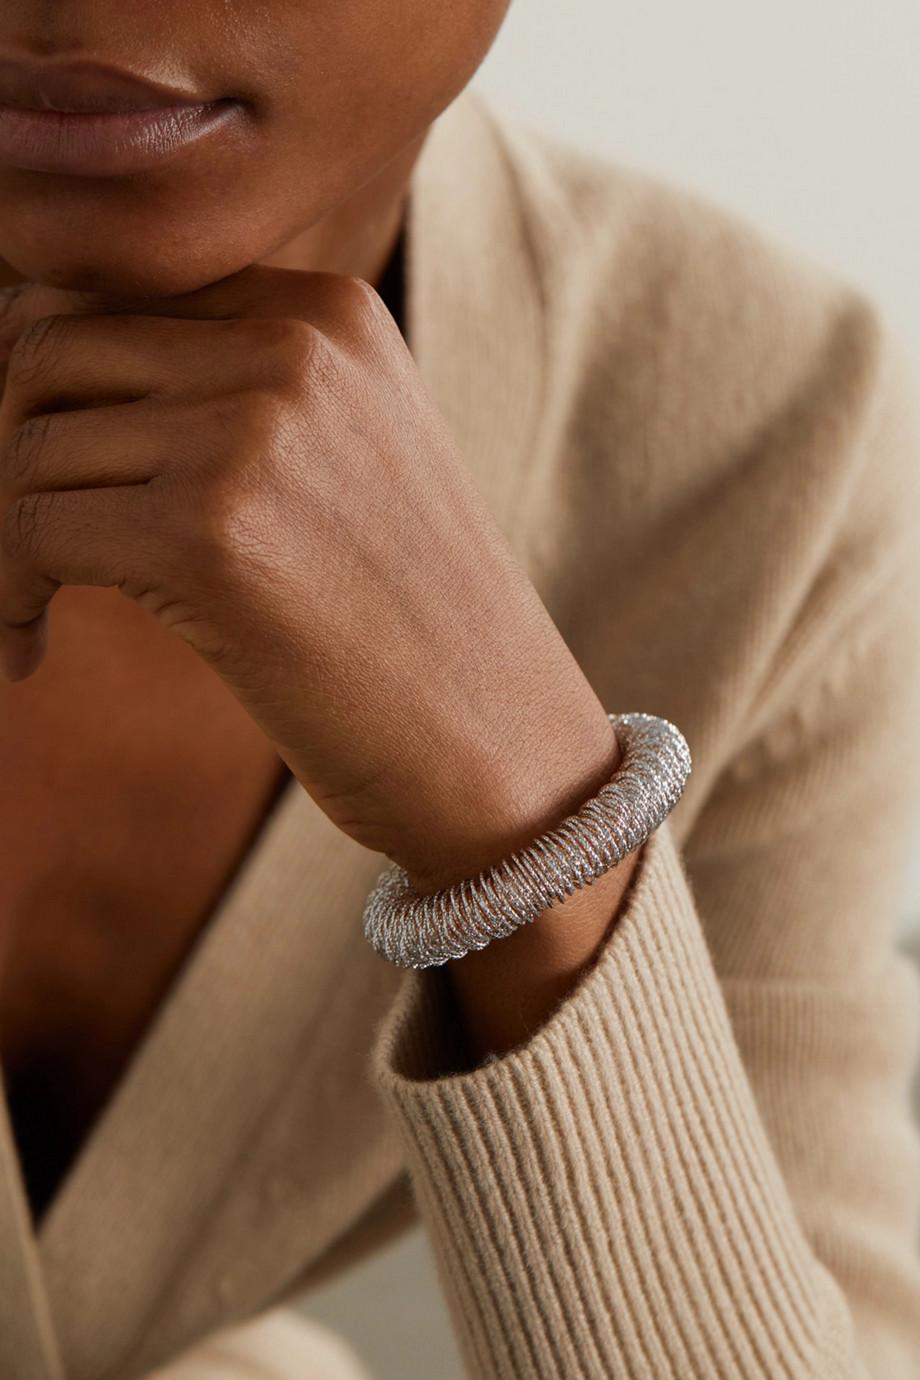 Carolina Bucci K.I.S.S. Large Armband aus 18 Karat Weiß- und Roségold